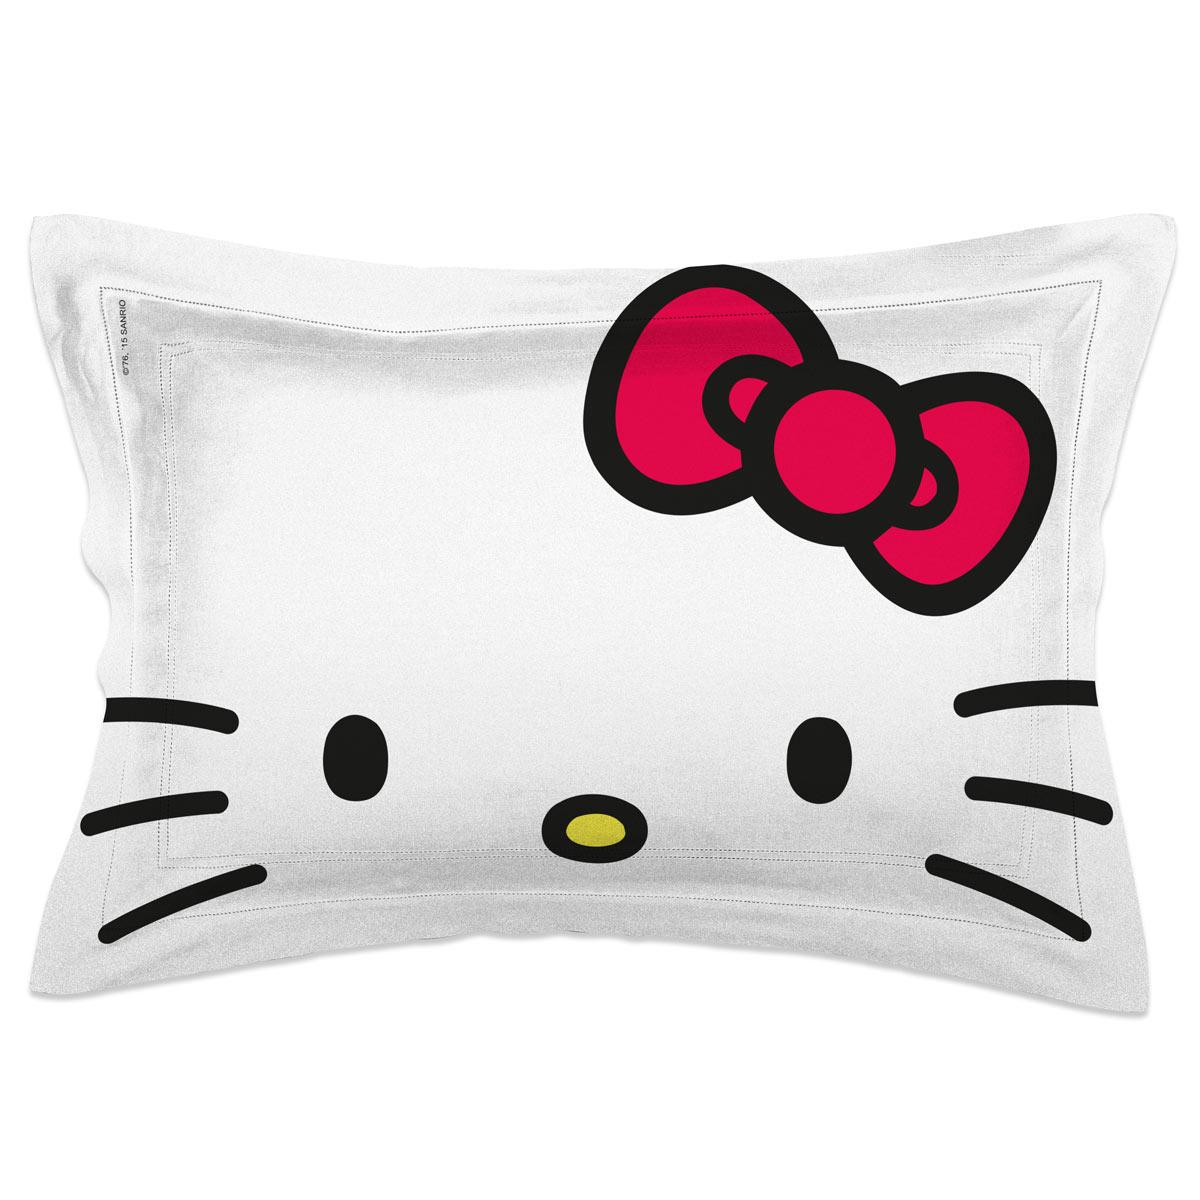 Capa para Travesseiro Helo Kitty White